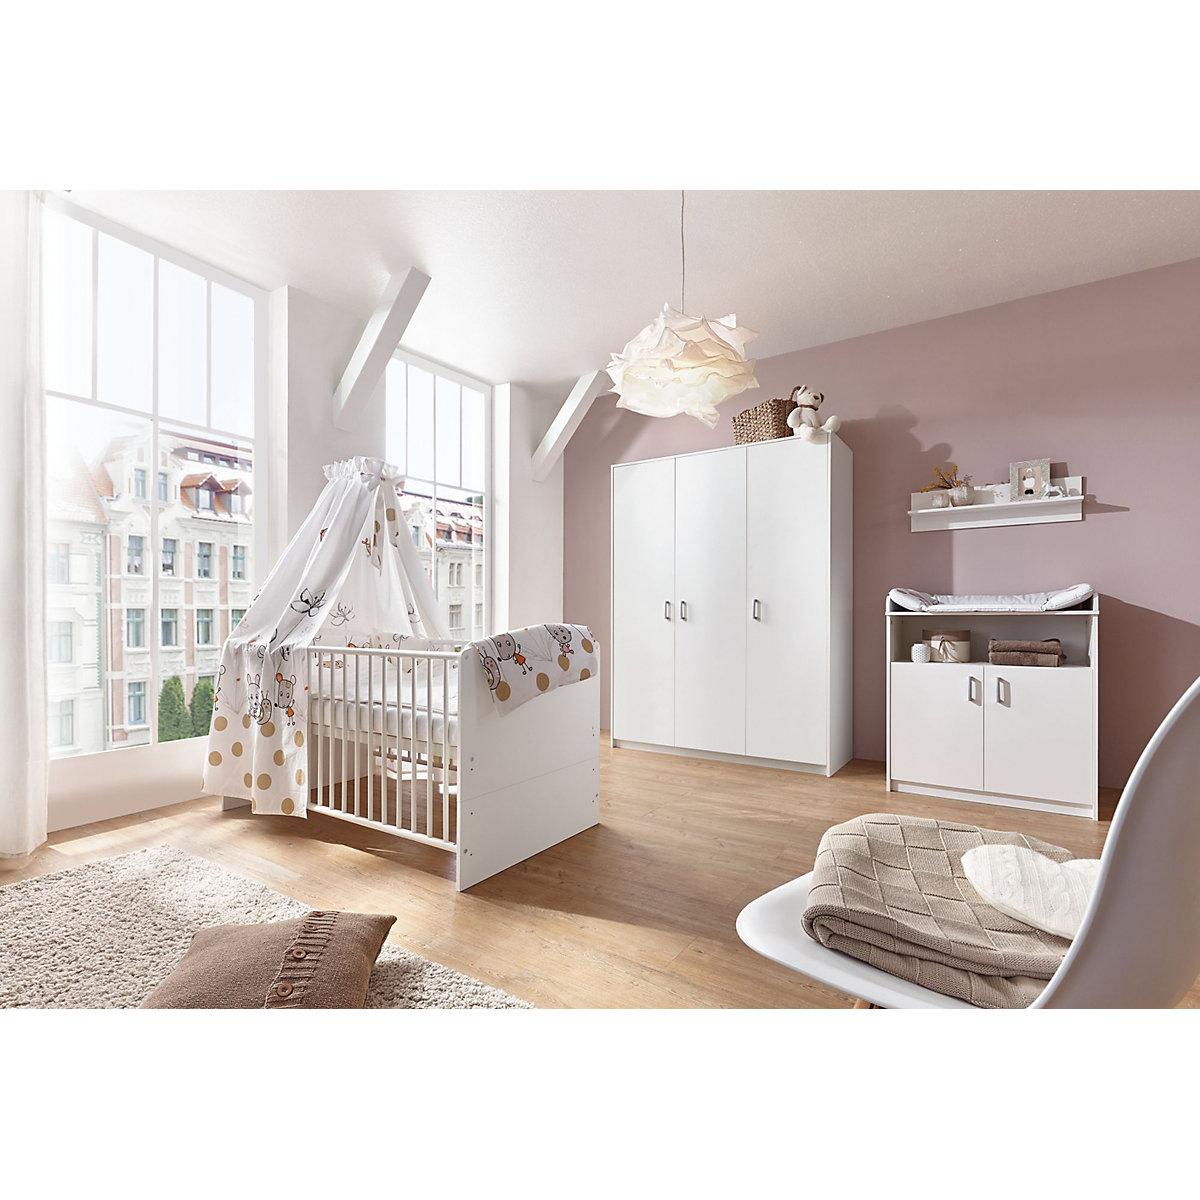 komplett kinderzimmer classic white kombi kinderbett 70 x 140 cm mit umbaukit wickelkommode. Black Bedroom Furniture Sets. Home Design Ideas